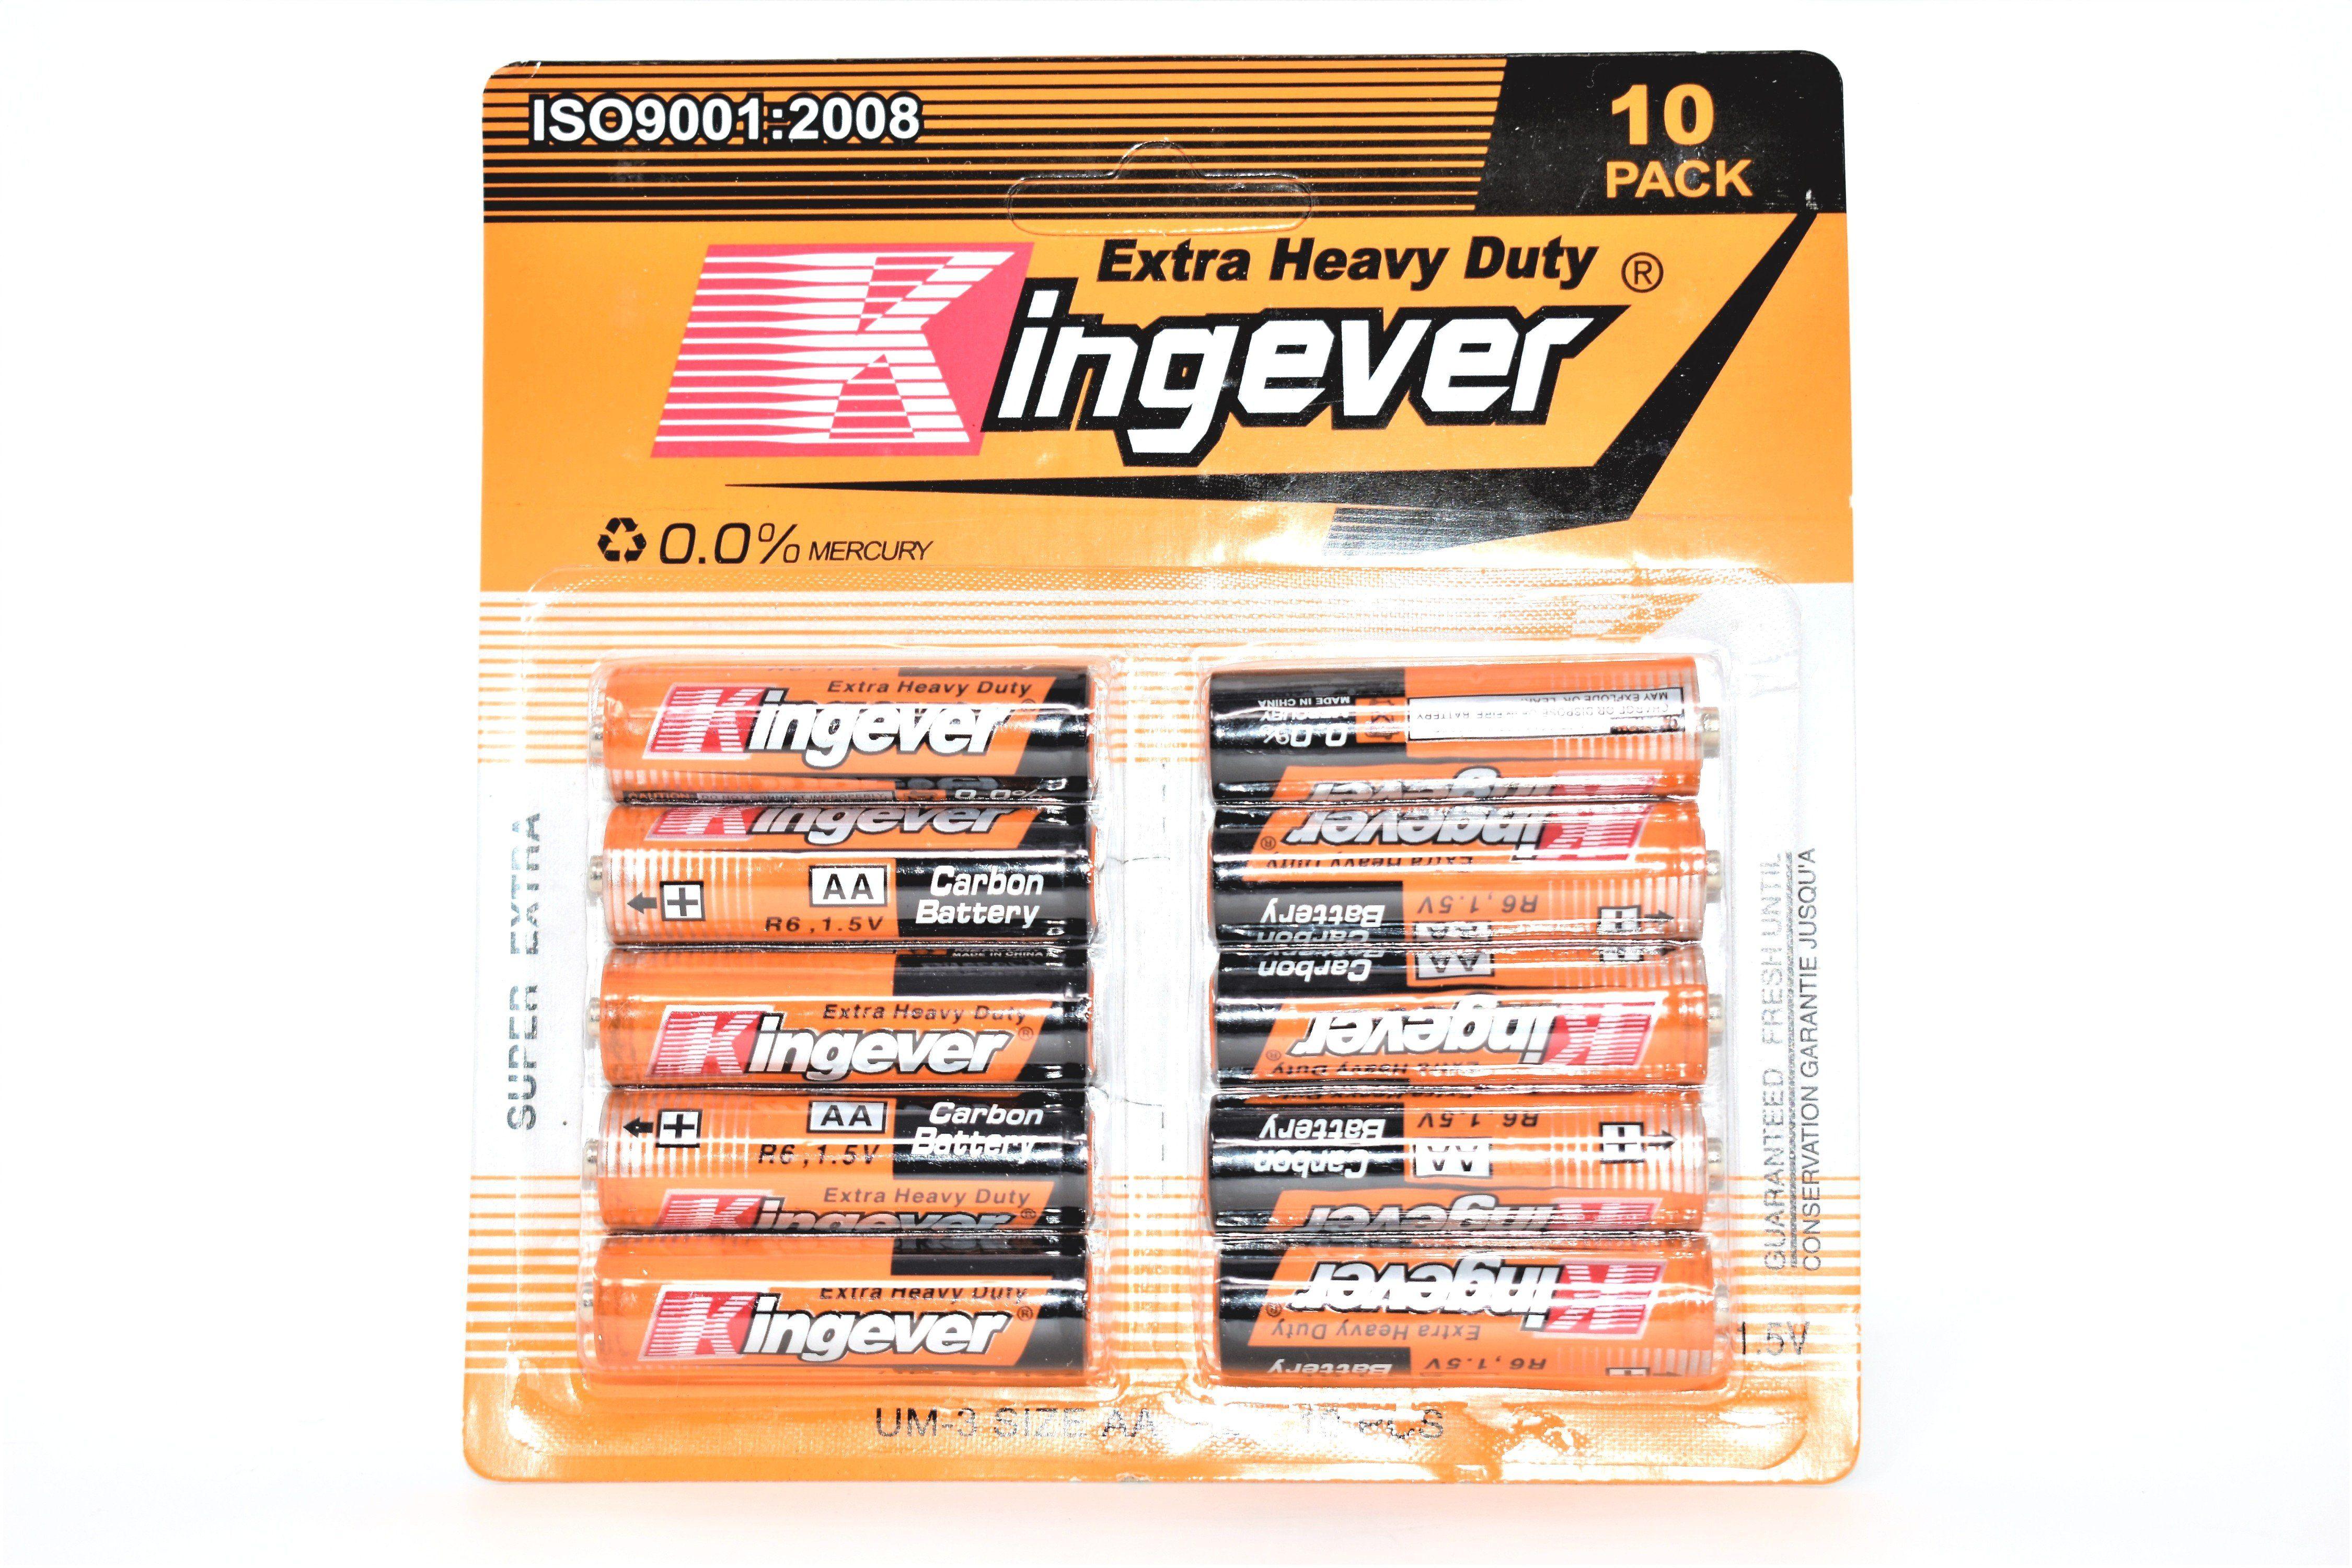 Kingever Extra Heavy Duty Aa Batteries 10 Pack Heavy Duty Heavy Batteries